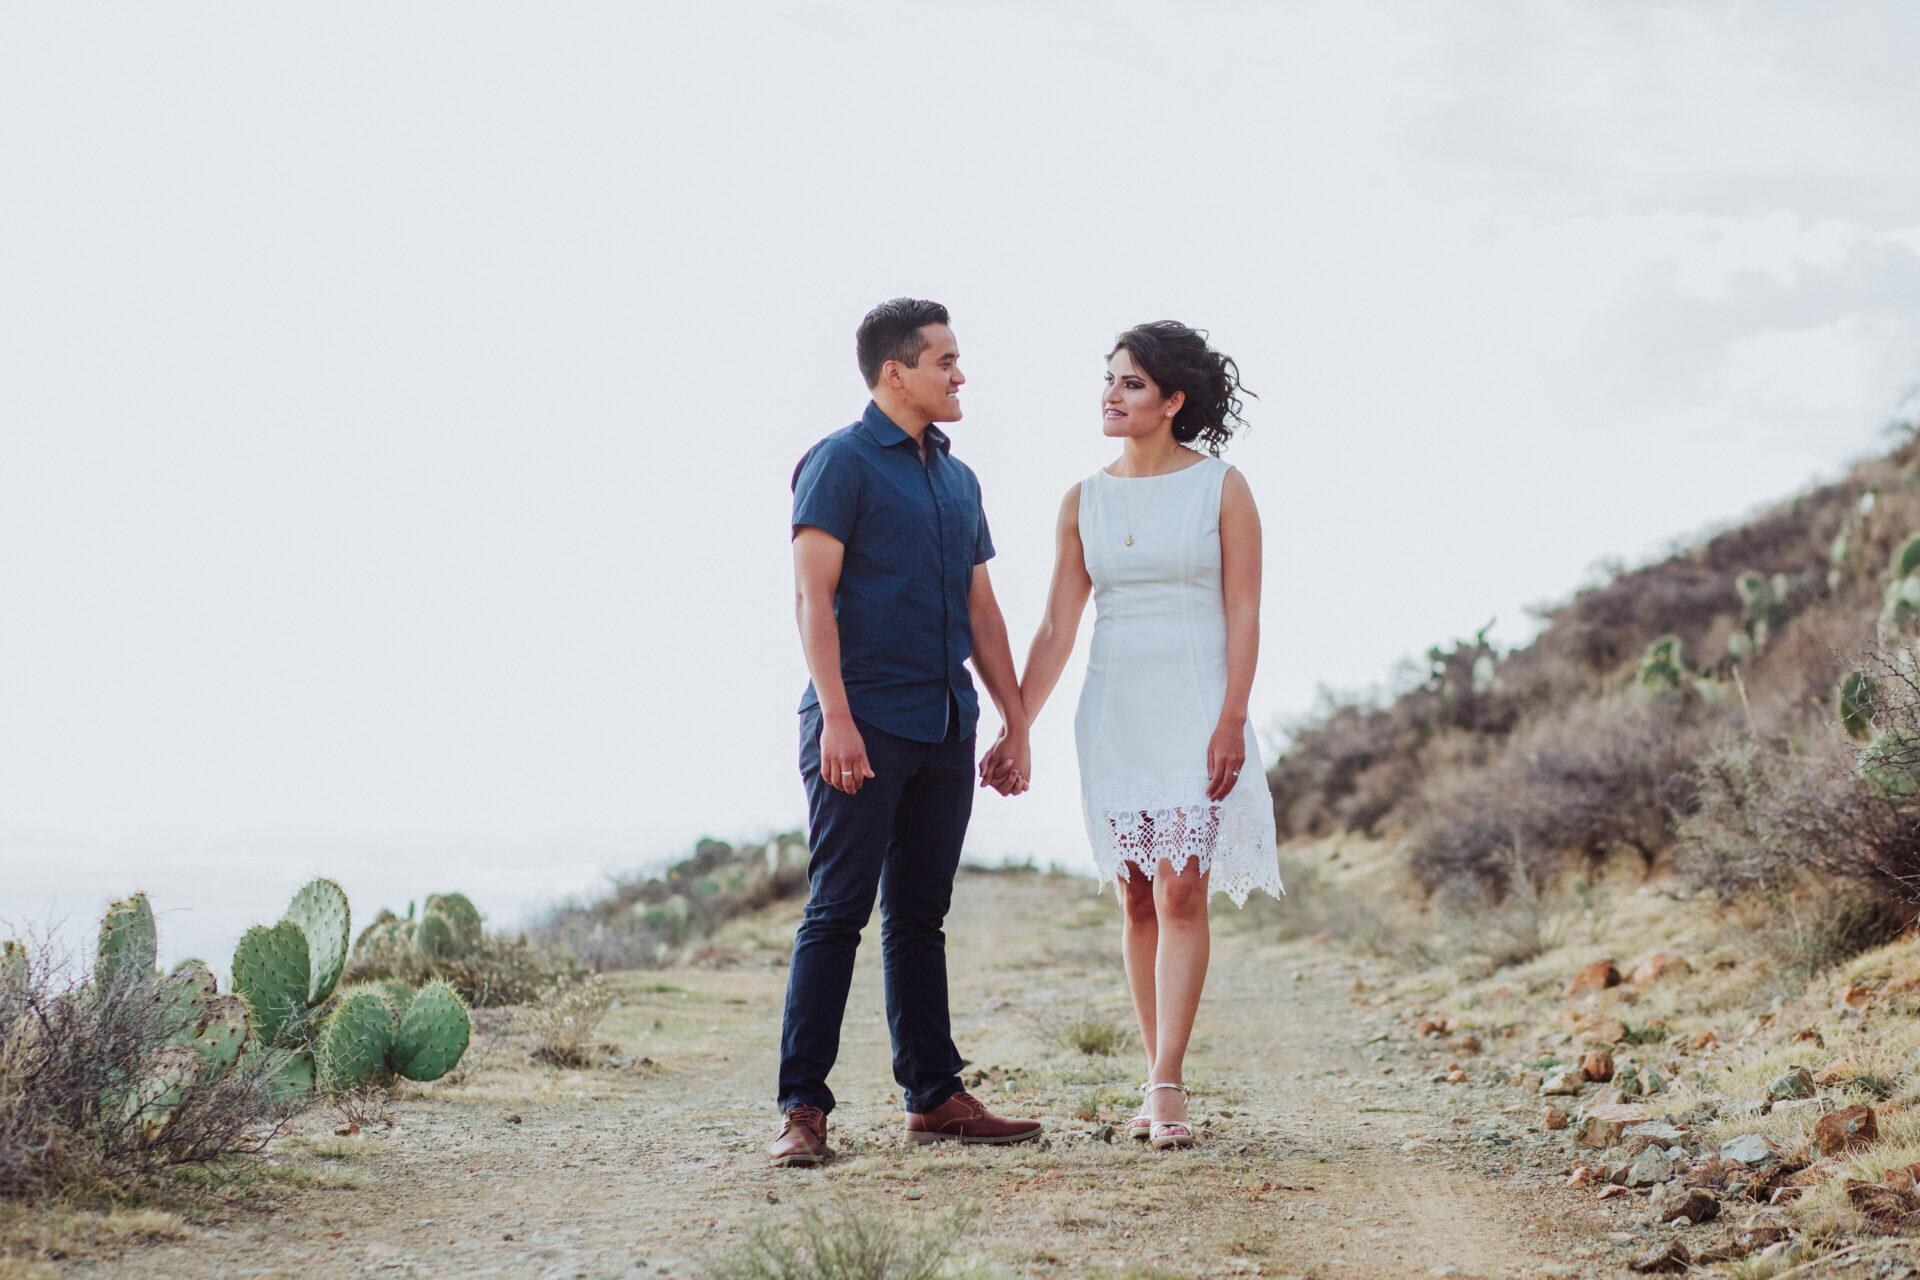 javier_noriega_fotografo_save_the_date_zacatecas_wedding_photographer1